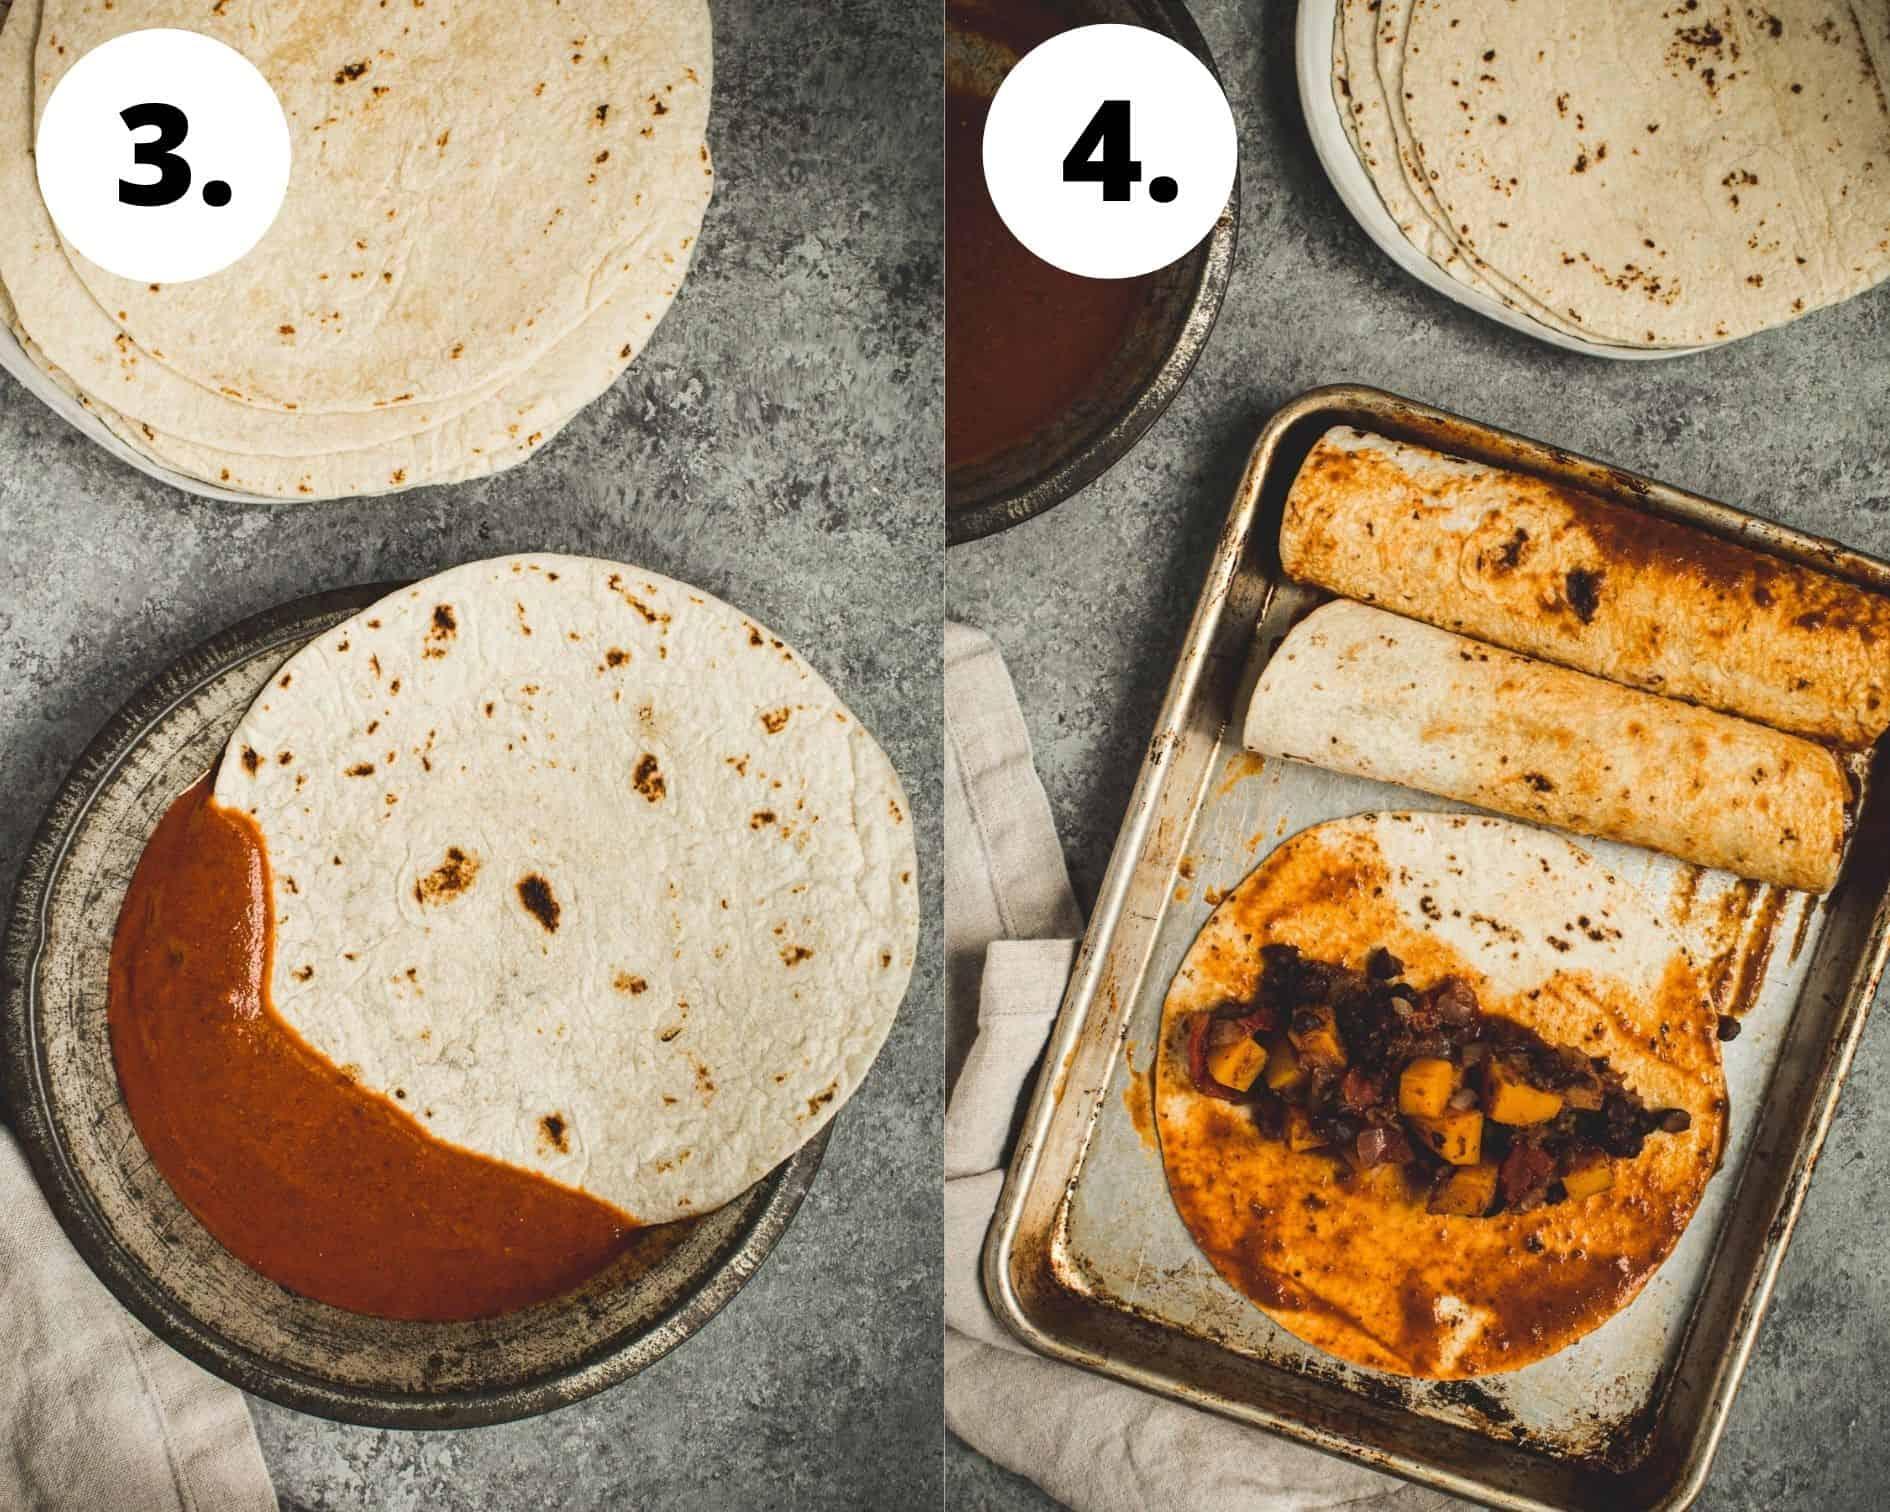 Butternut squash enchiladas process steps 3 and 4.